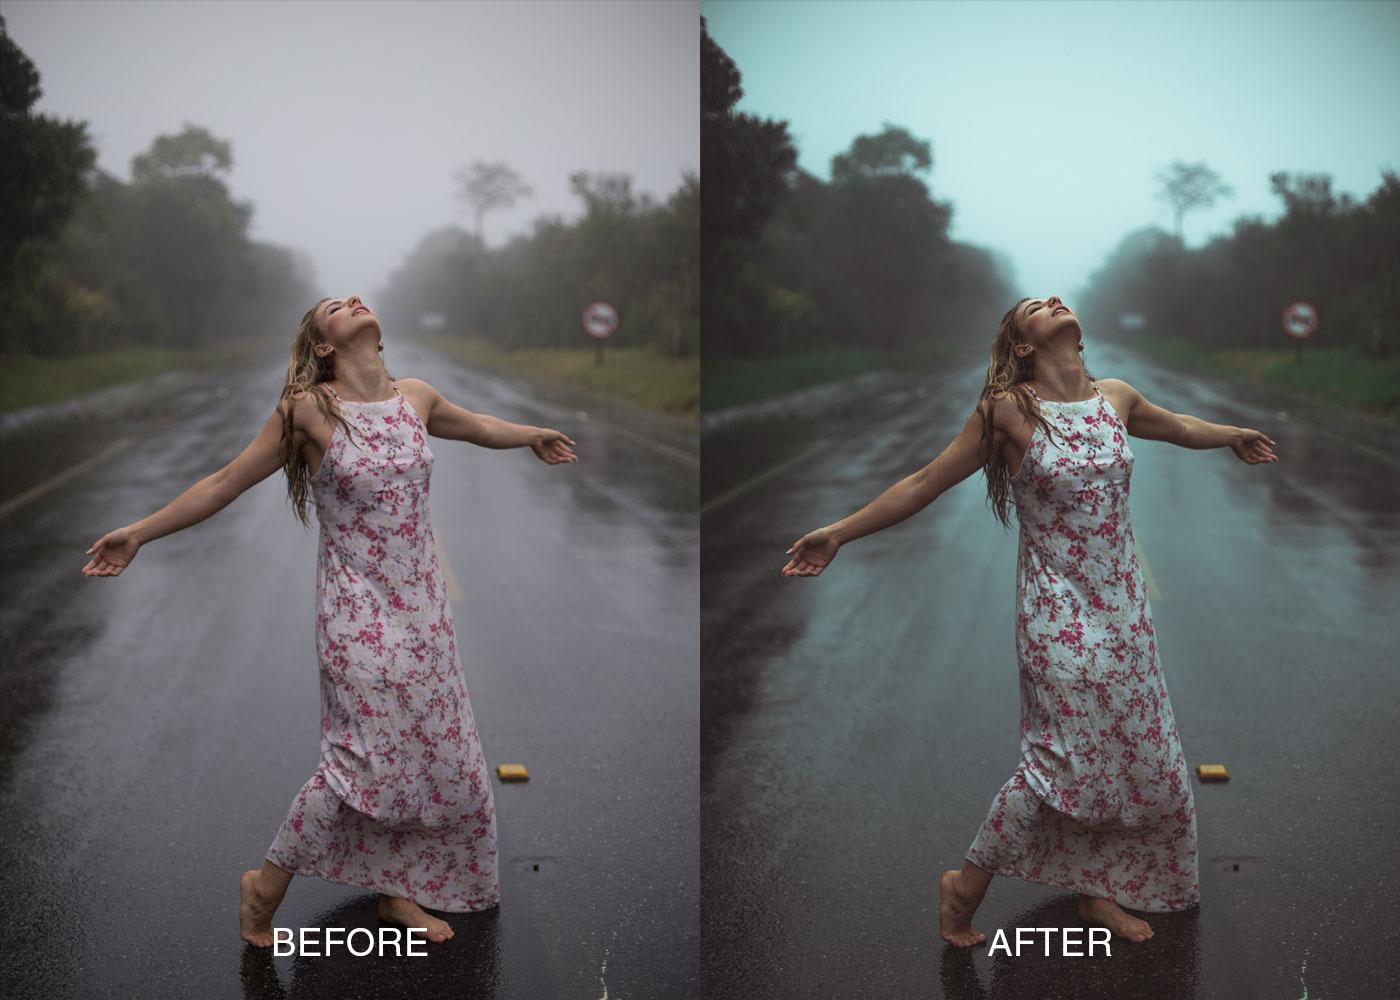 PORTRAIT-4Luis Dalvan Portrait Lightroom Presets FilterGrade